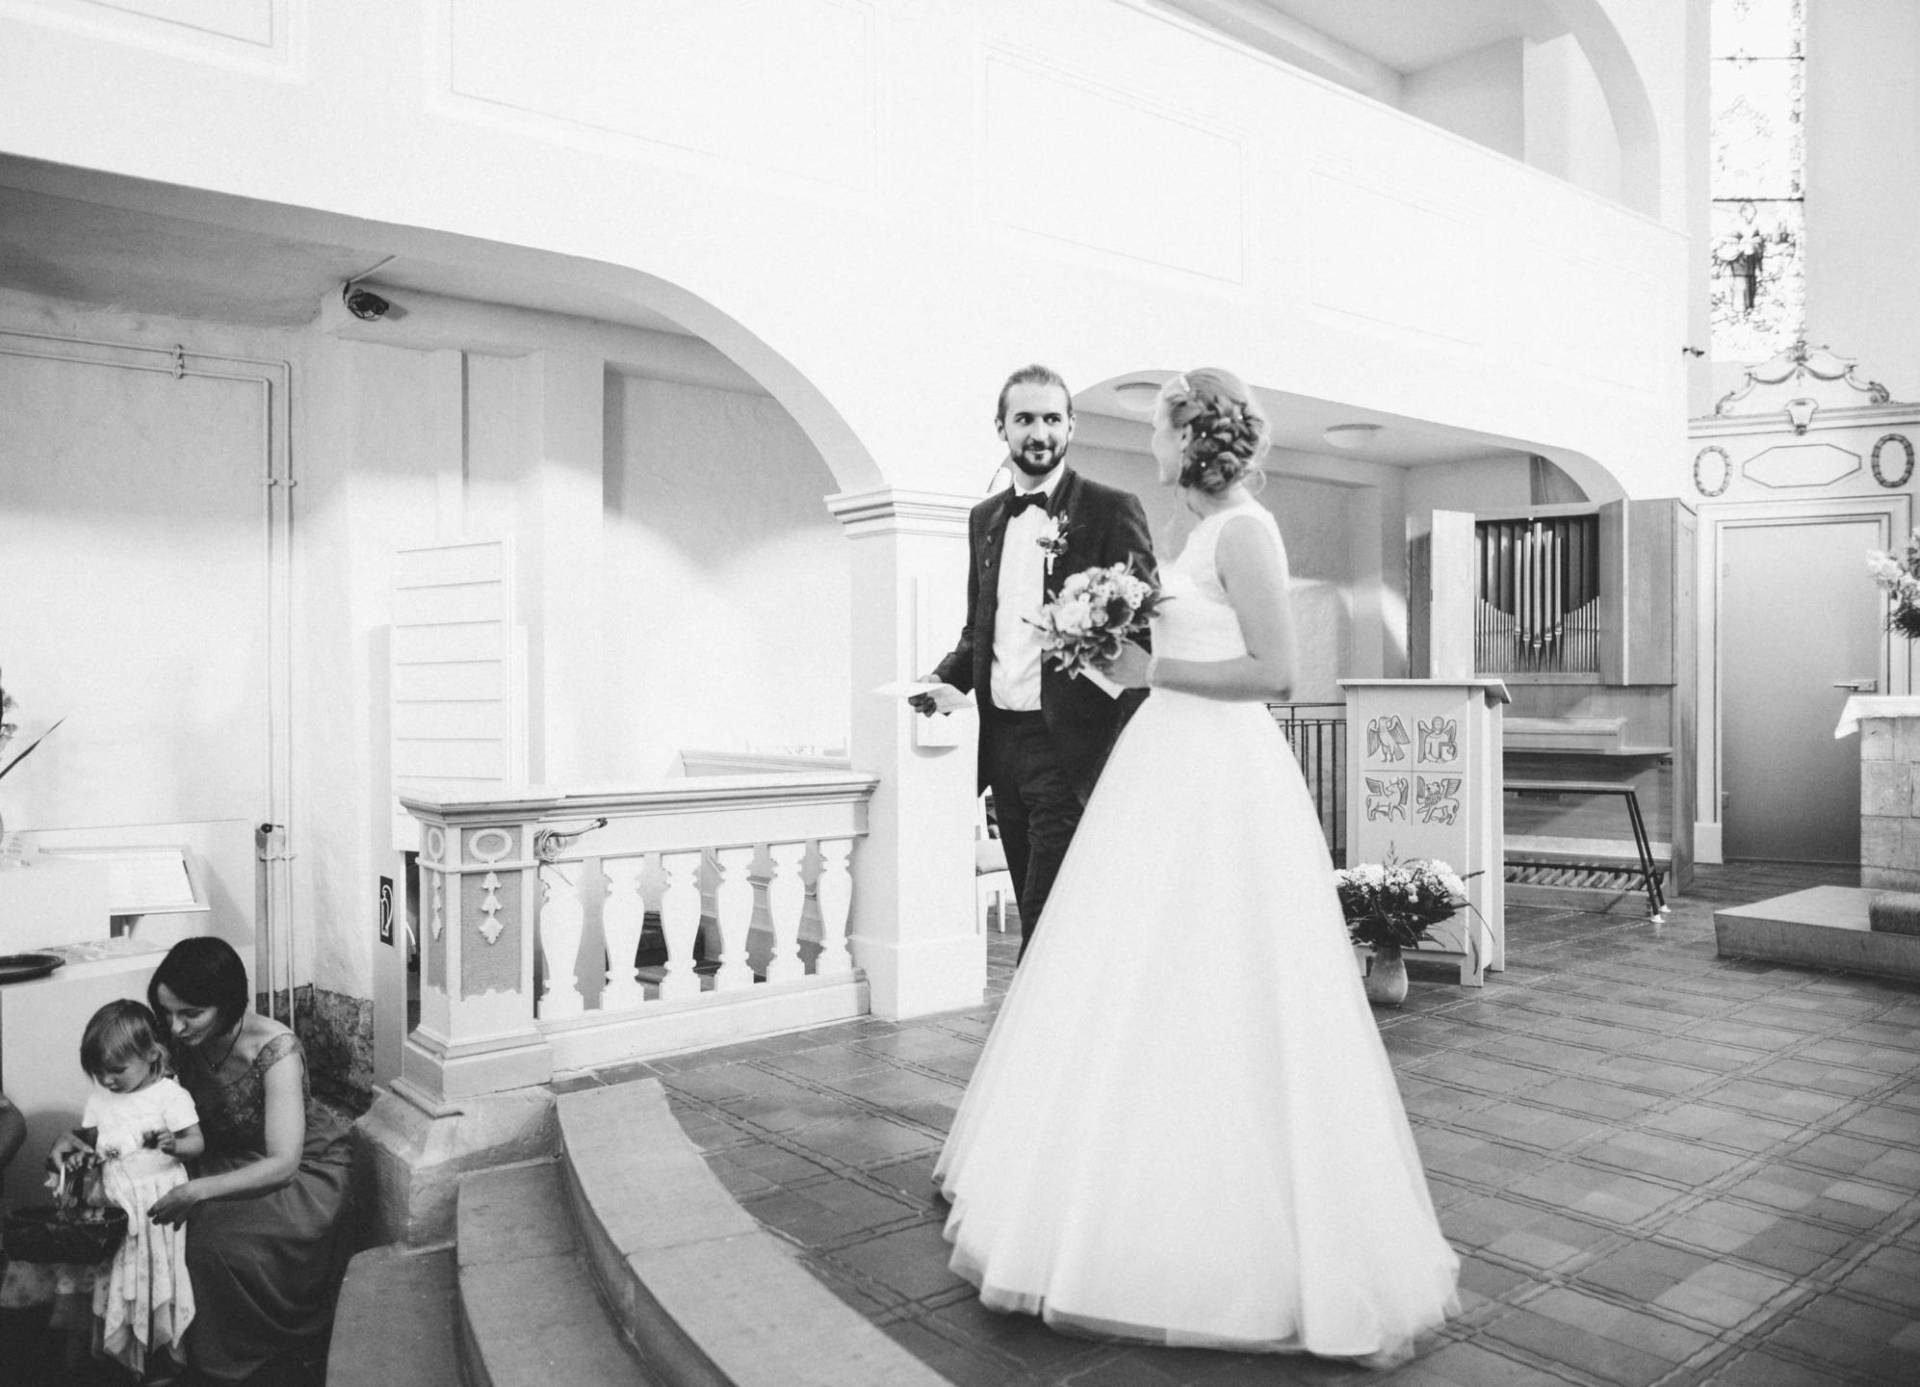 JuleSascha 16 1920x1387 - Hochzeit im alten Dornburger Schloss